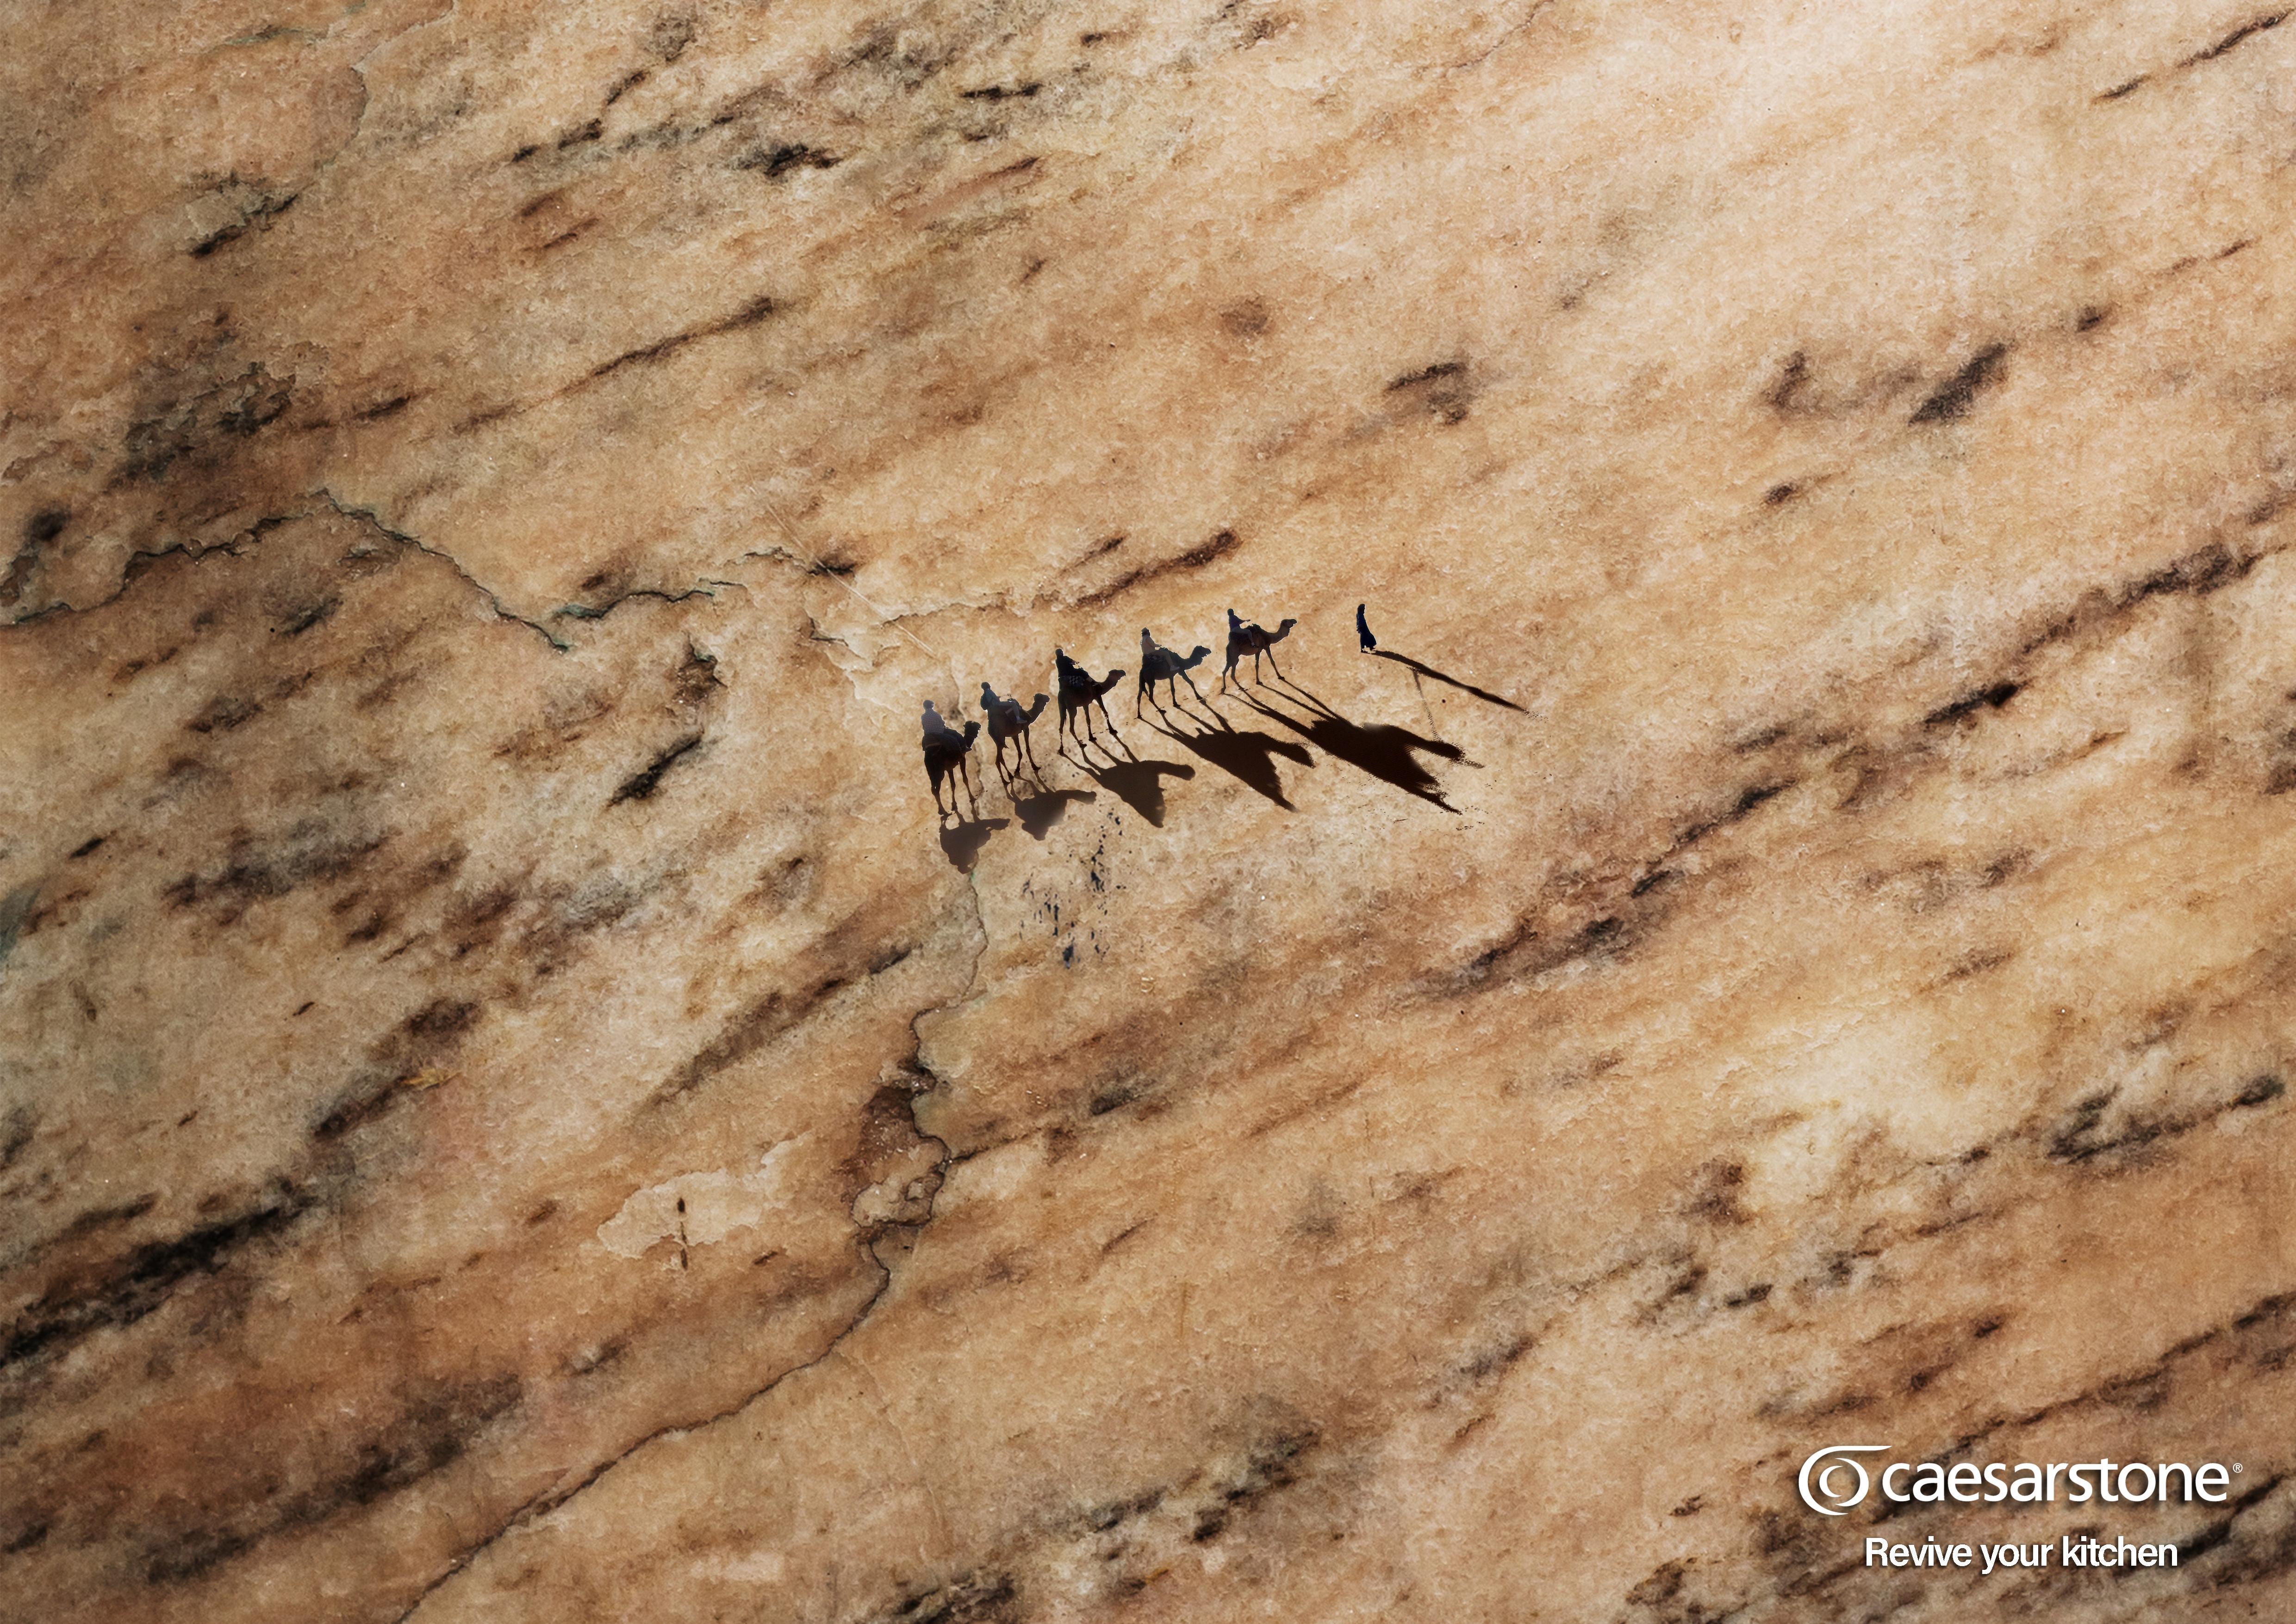 Caesar Stone Print Ad - Revive Your Kitchen, 2